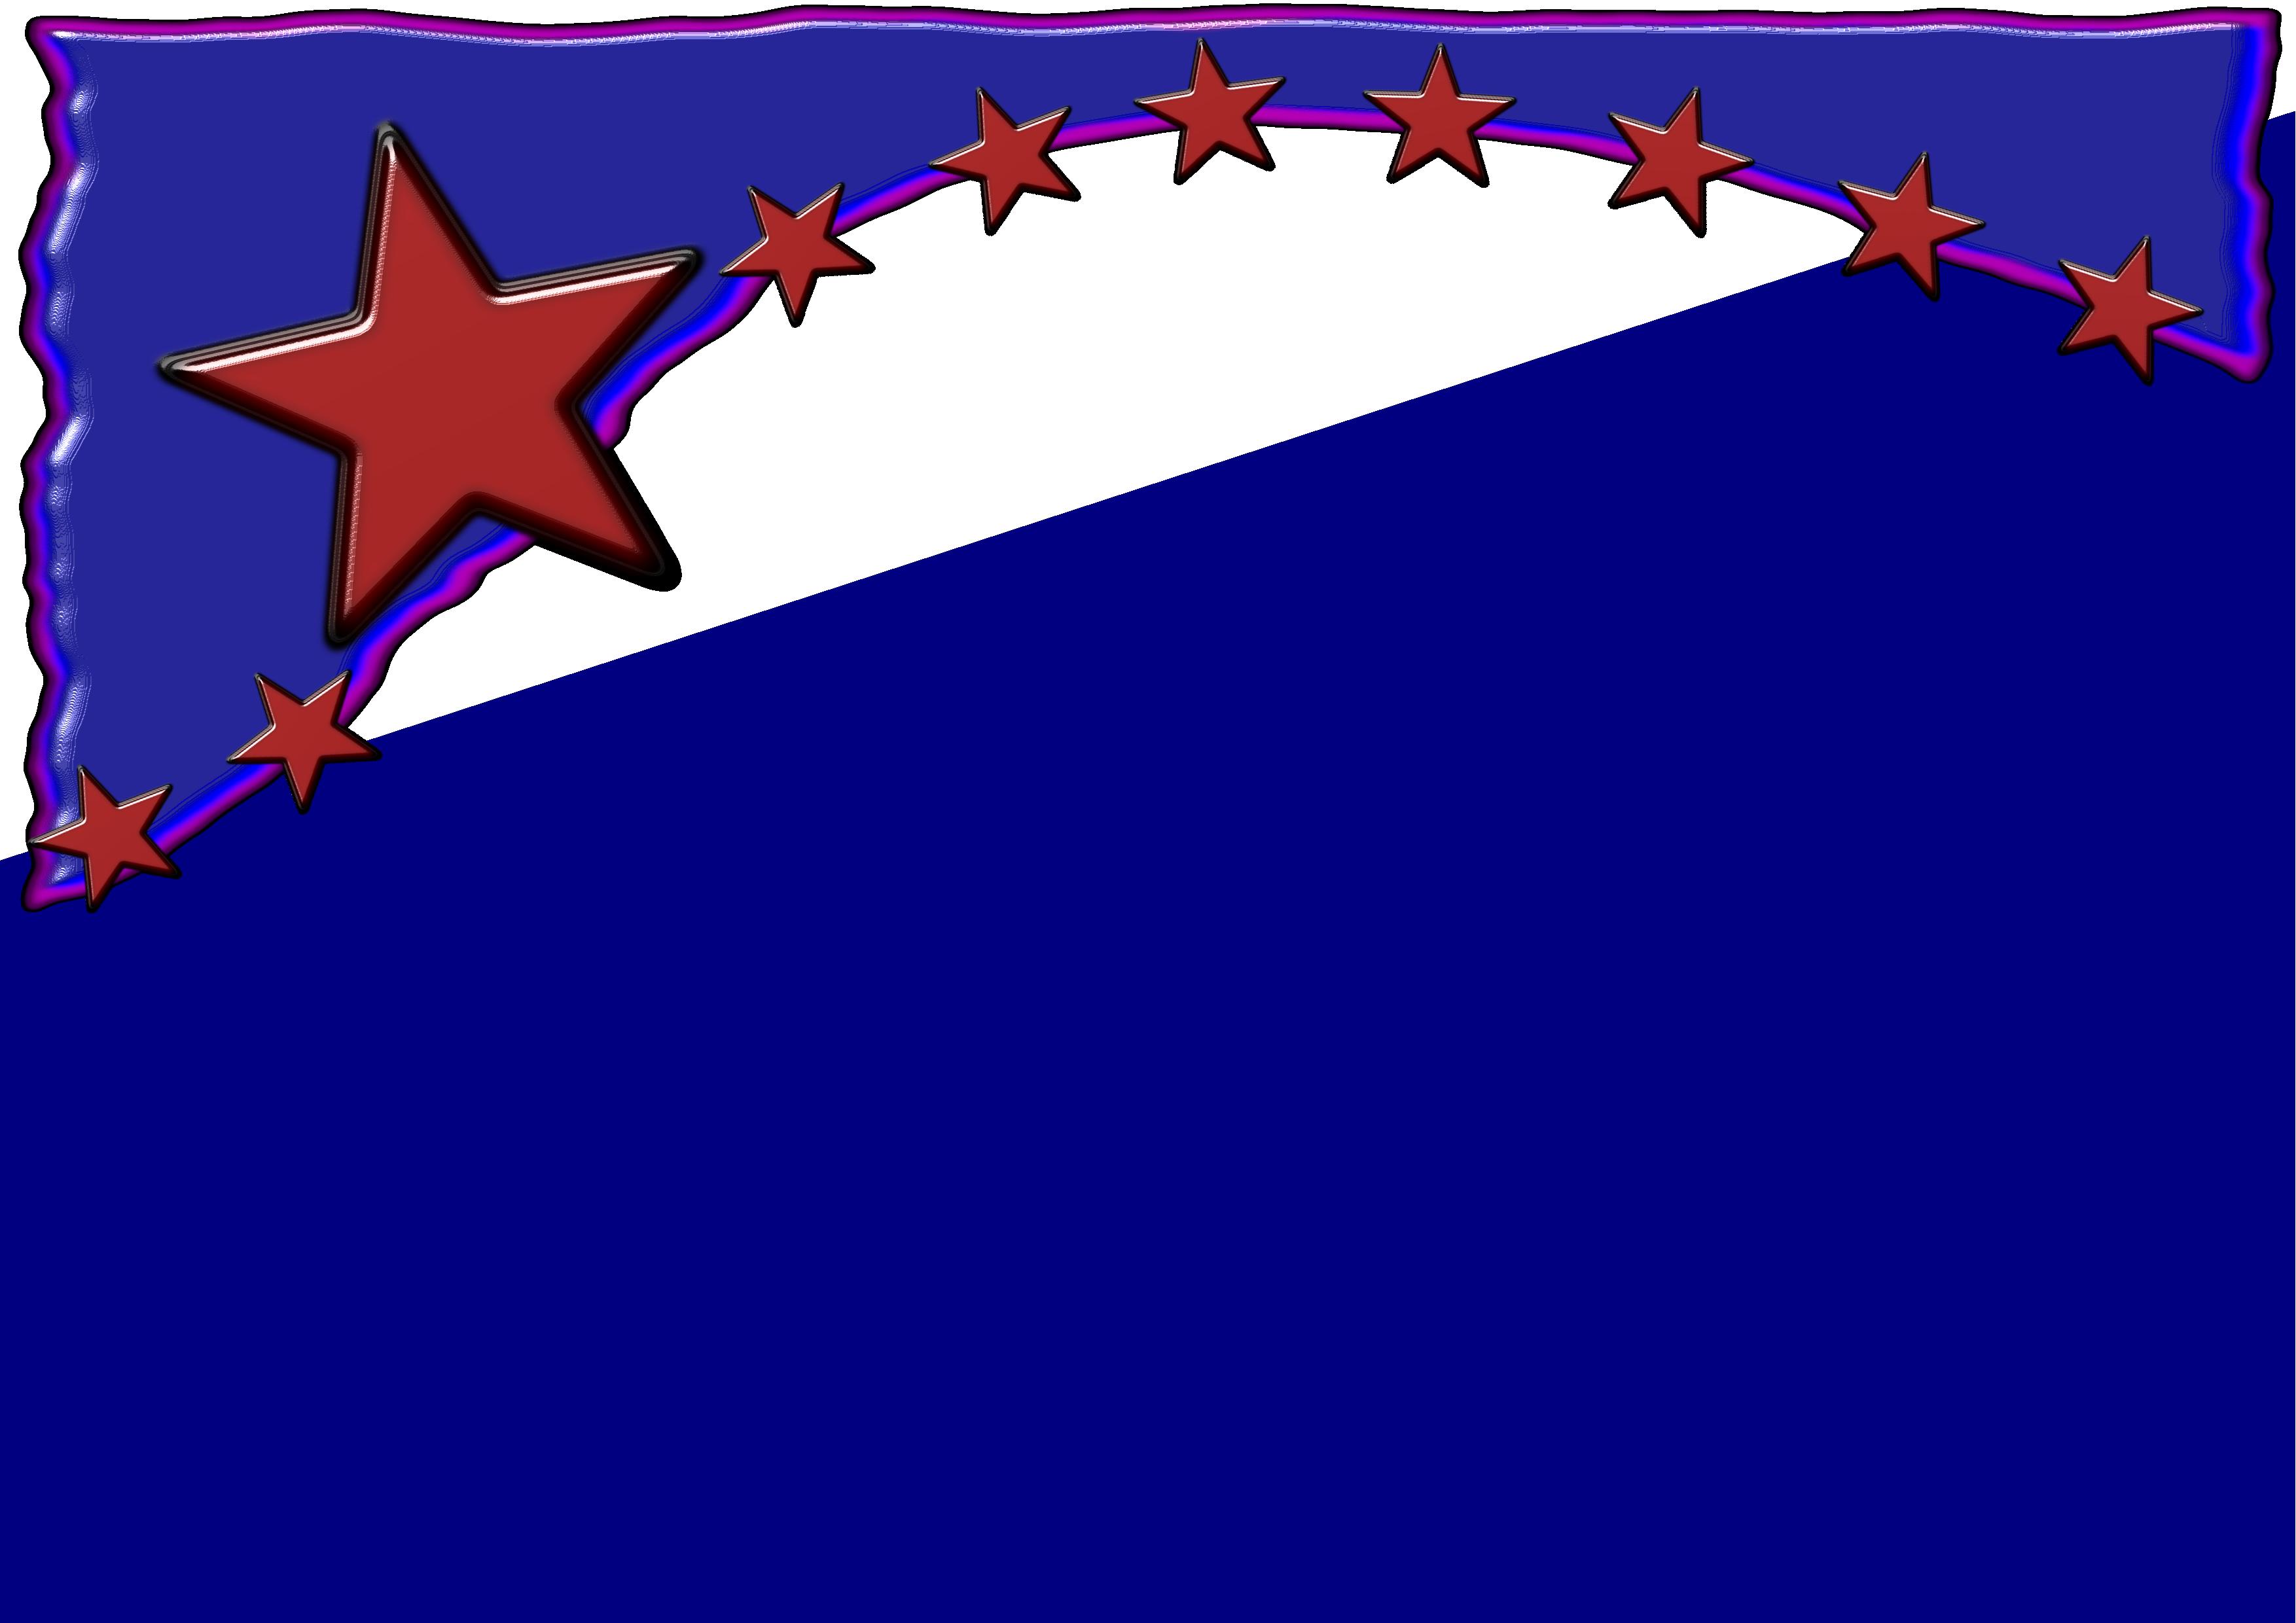 American stars border clipart picture black and white stock Free Flag Border Cliparts, Download Free Clip Art, Free Clip Art on ... picture black and white stock